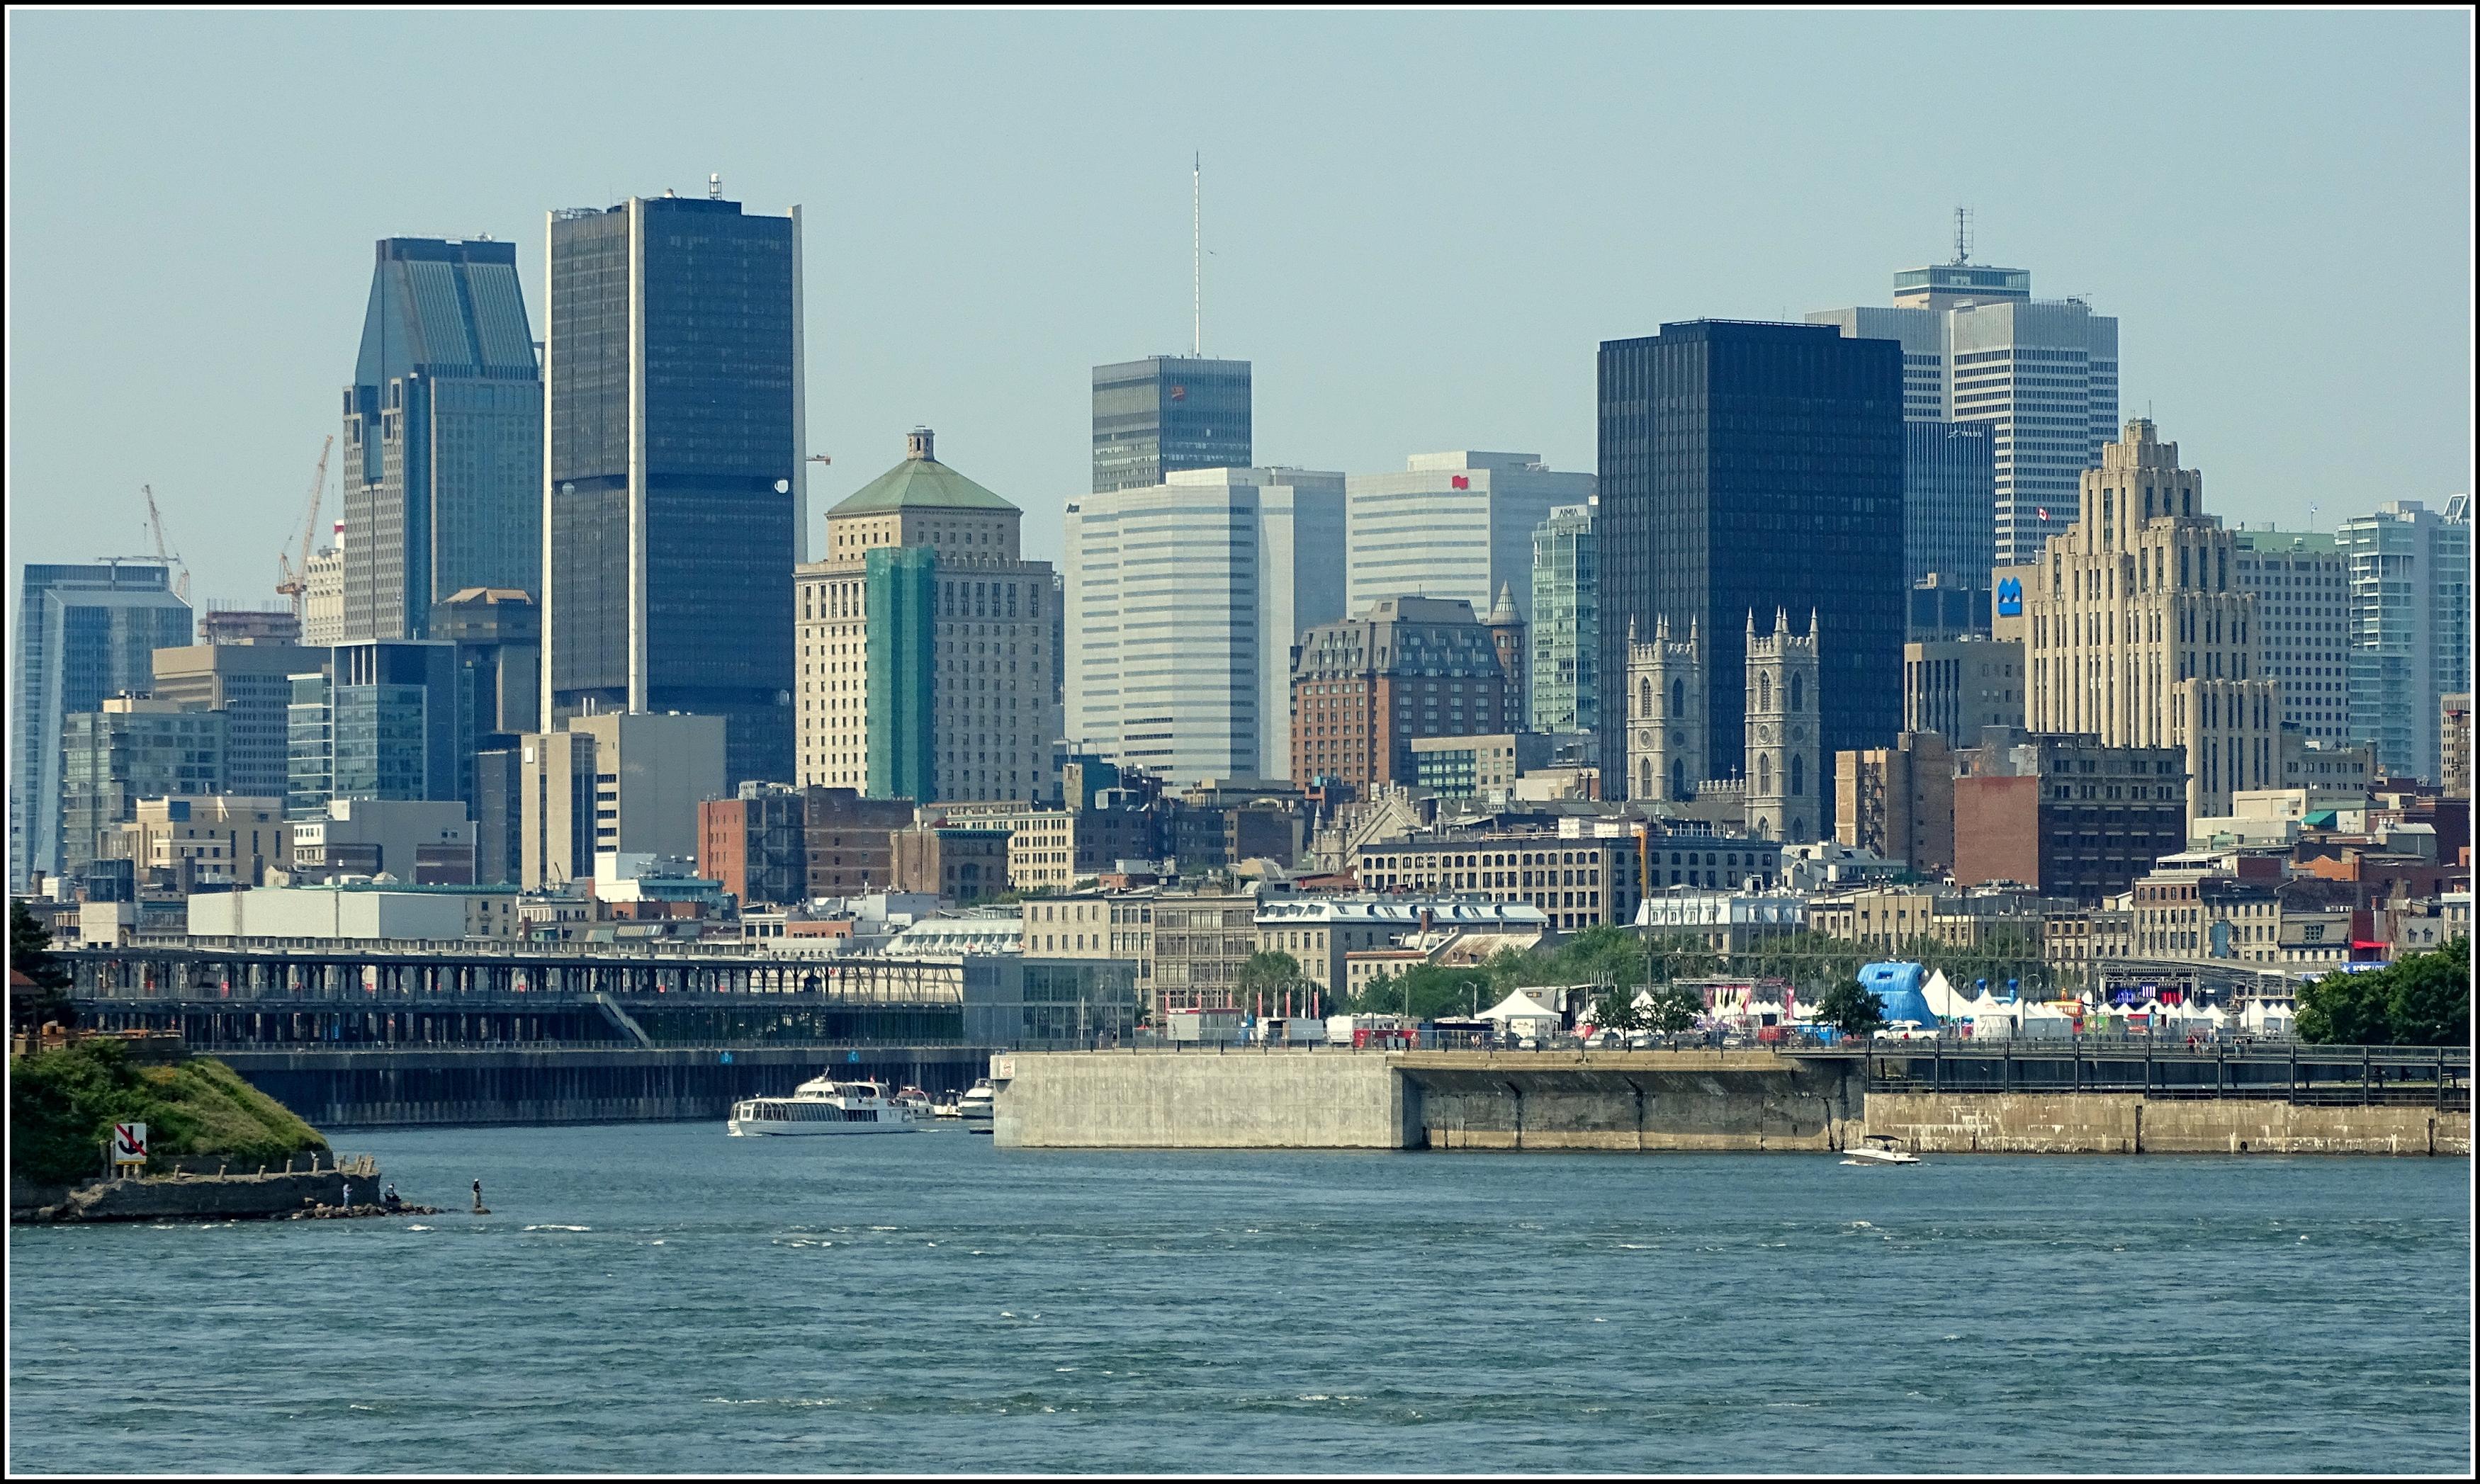 Skyline #7: Montréal, a photo from Quebec, Central | TrekEarth